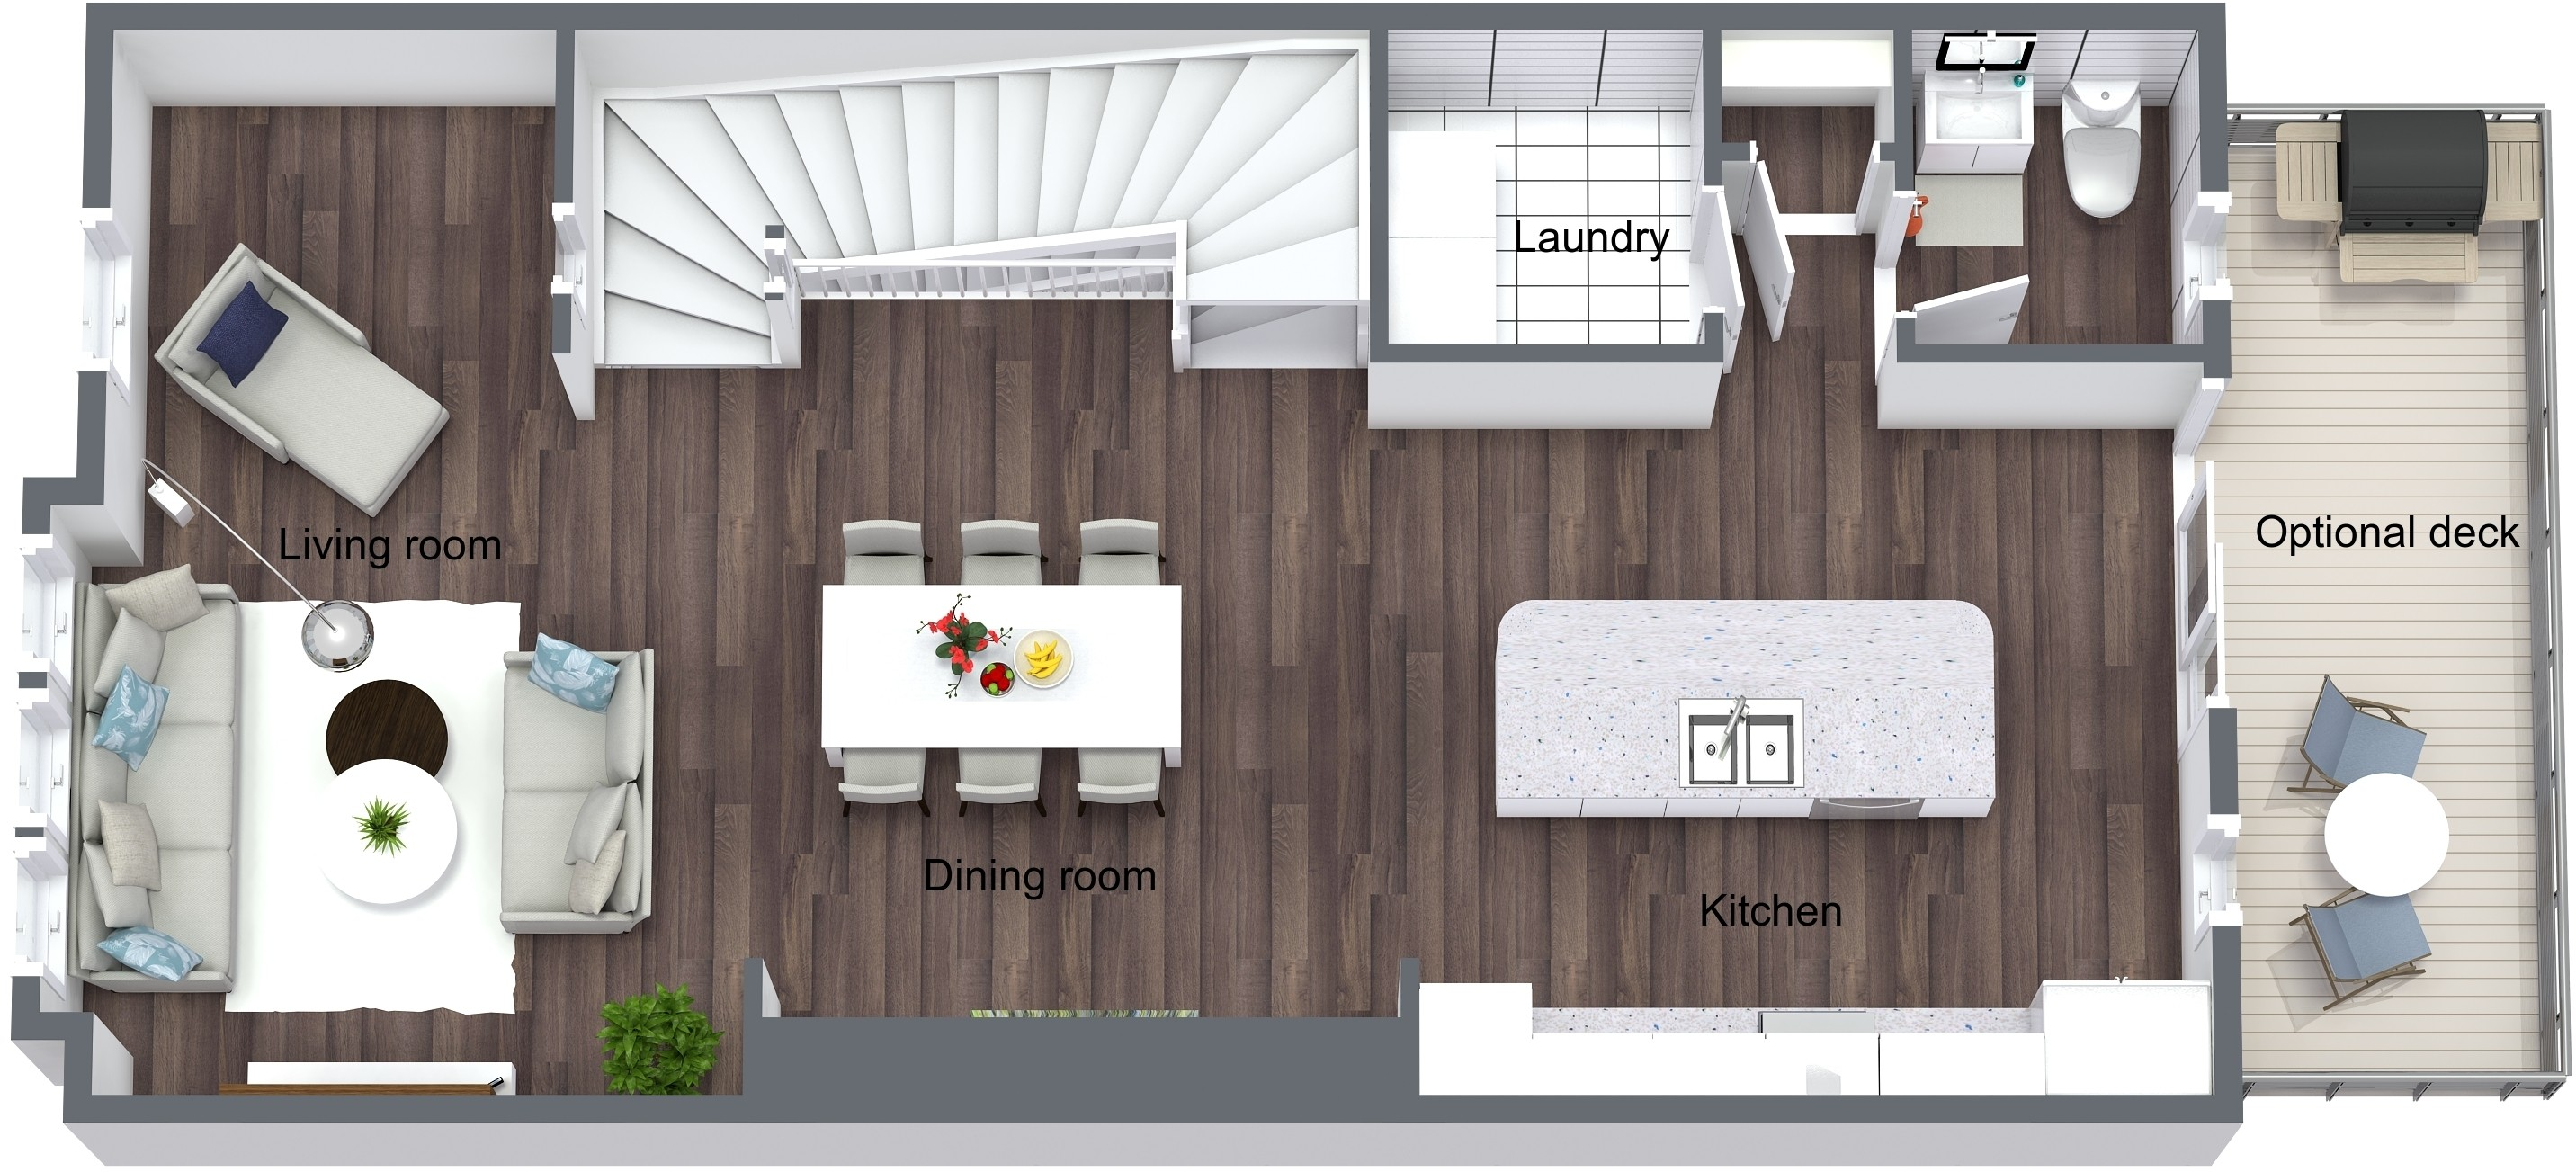 Holly Springs Townhomes - Lot 1 - First Floor - 3D Floor Plan.jpeg